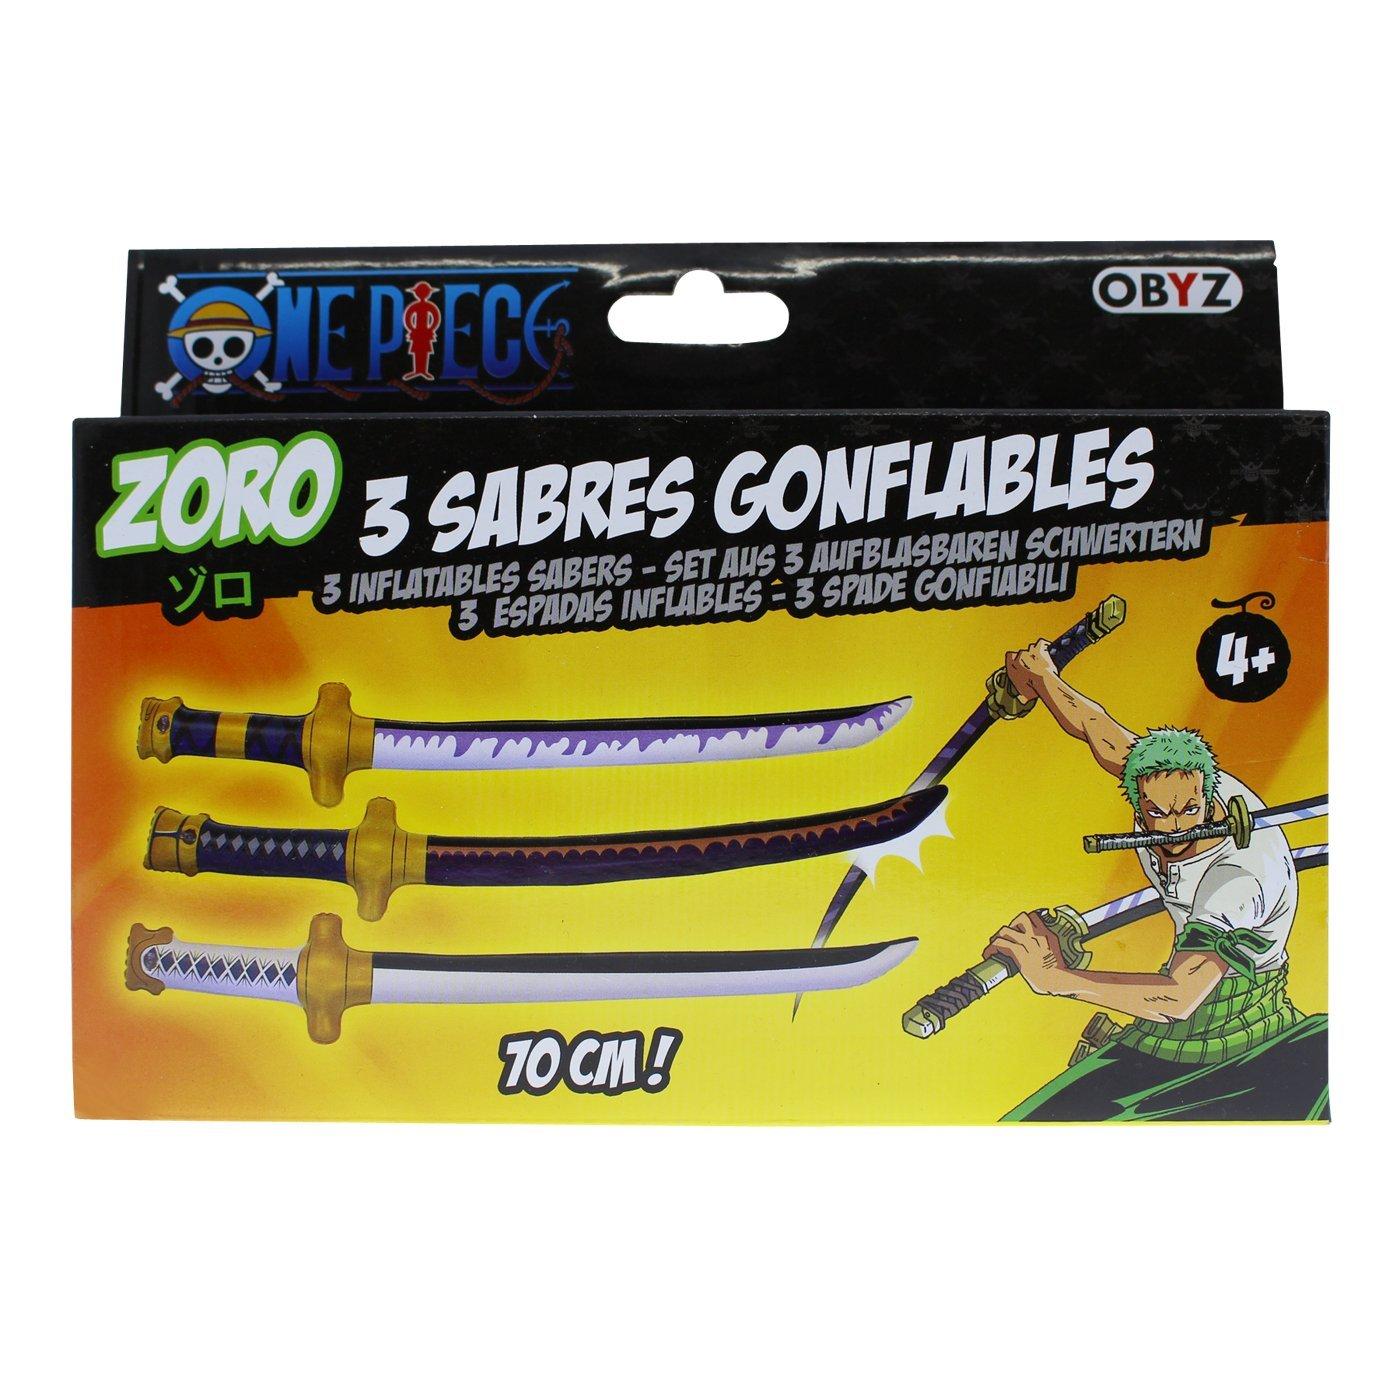 One Piece Cosplay Lorenor Zorro aufblasbare Schwerter Abysse Corp